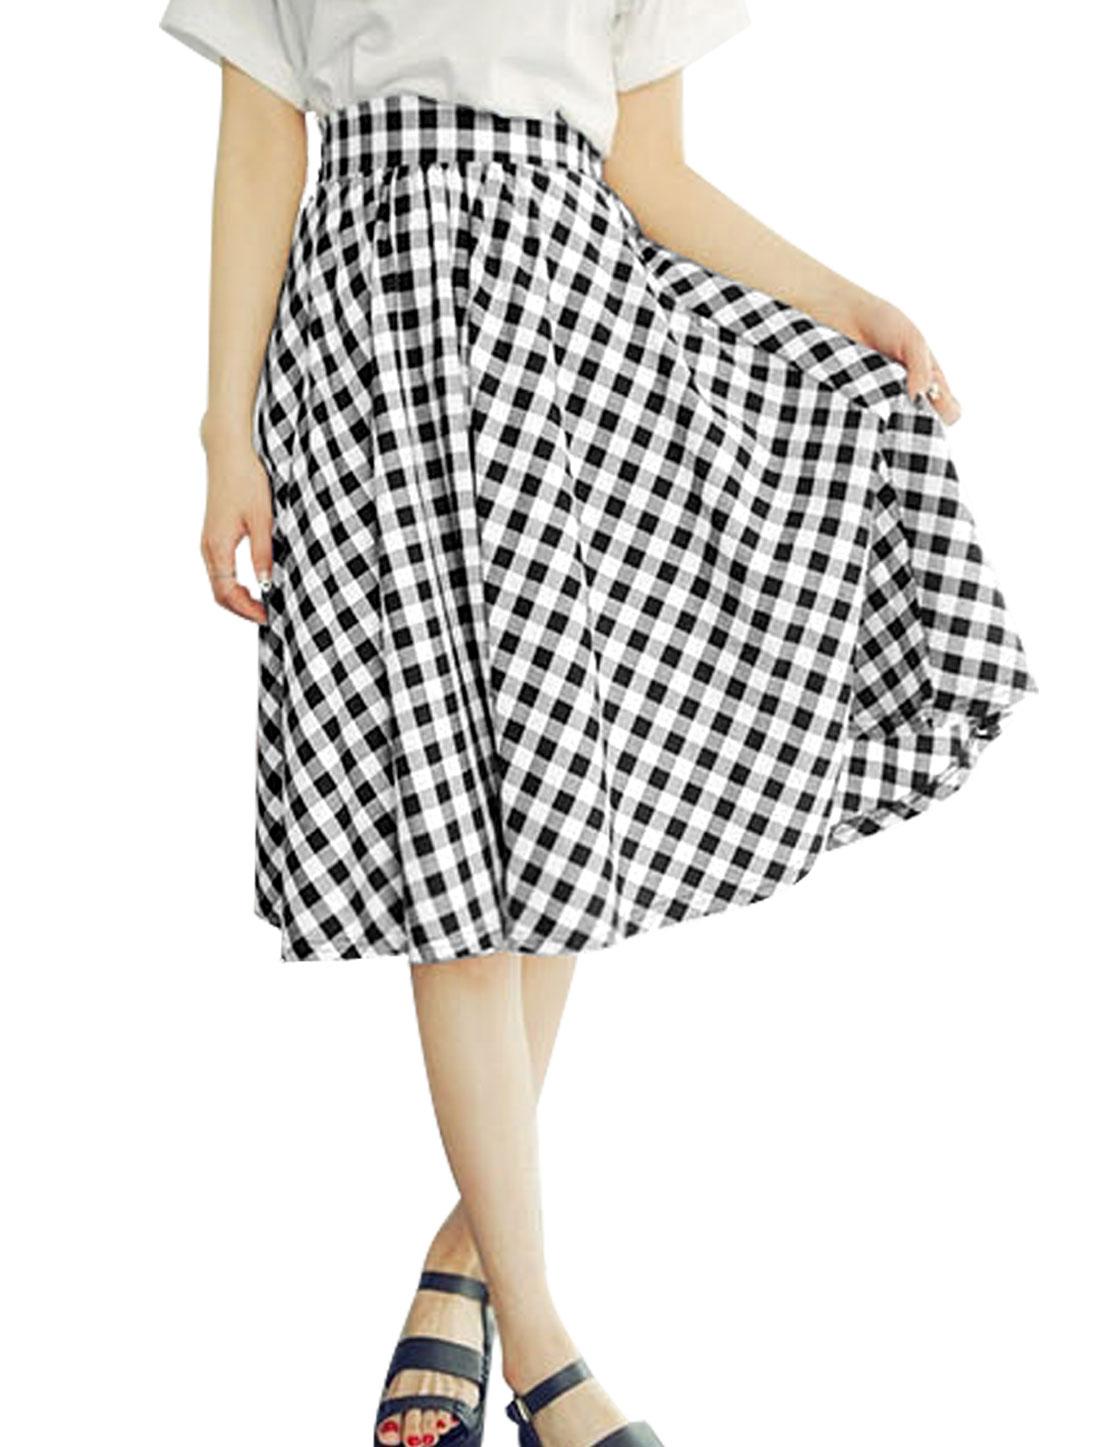 Lady Plaids Pattern Elastic Waist Zipper Back A-Line Skirt Black White S